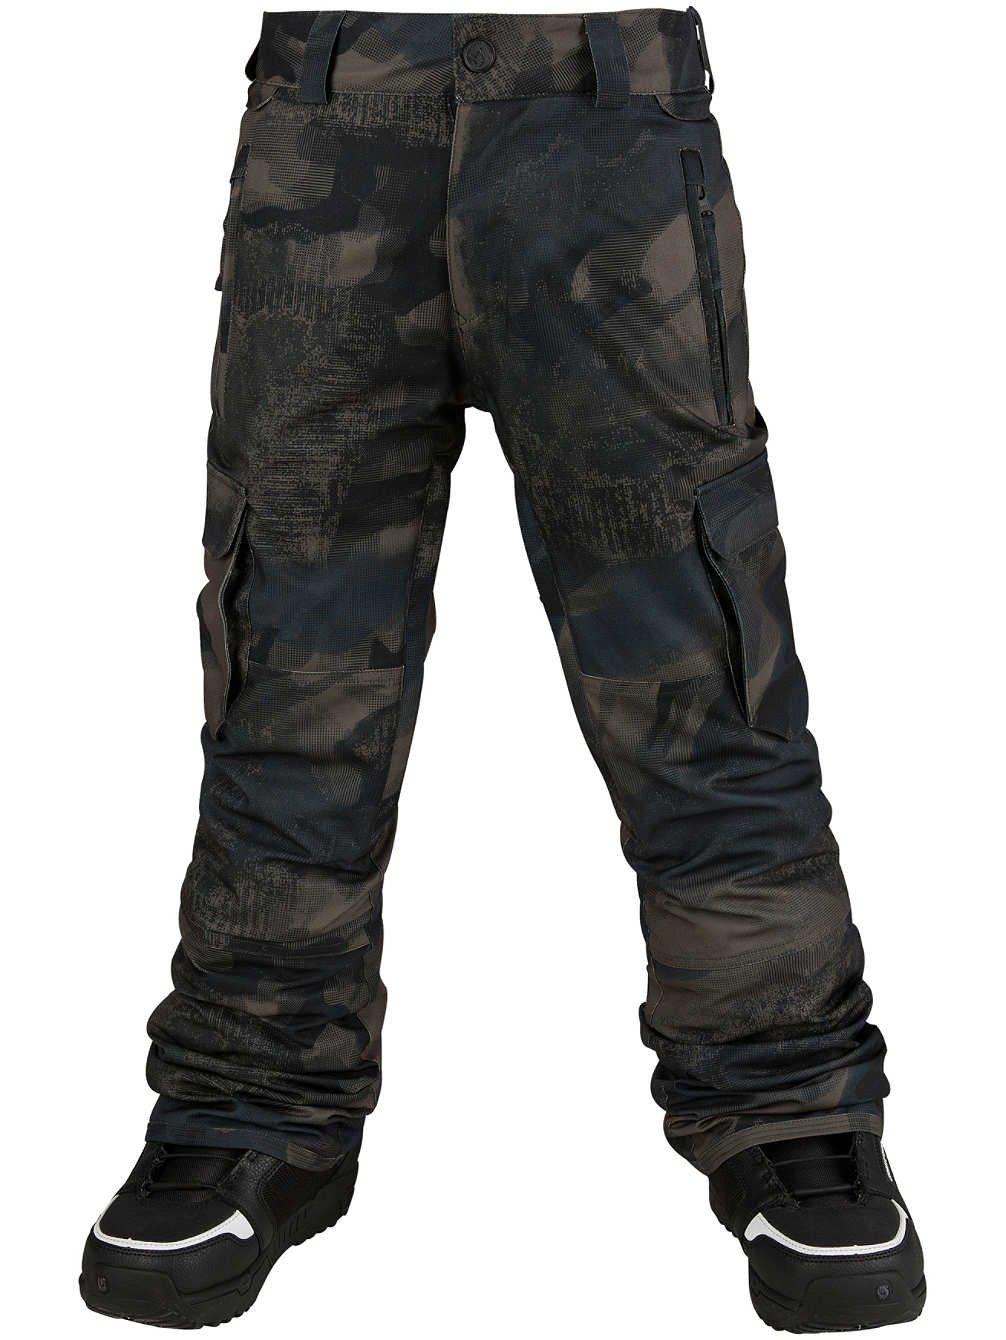 Volcom Big Boys' Cargo Insulated Pant, Camouflage, M by Volcom